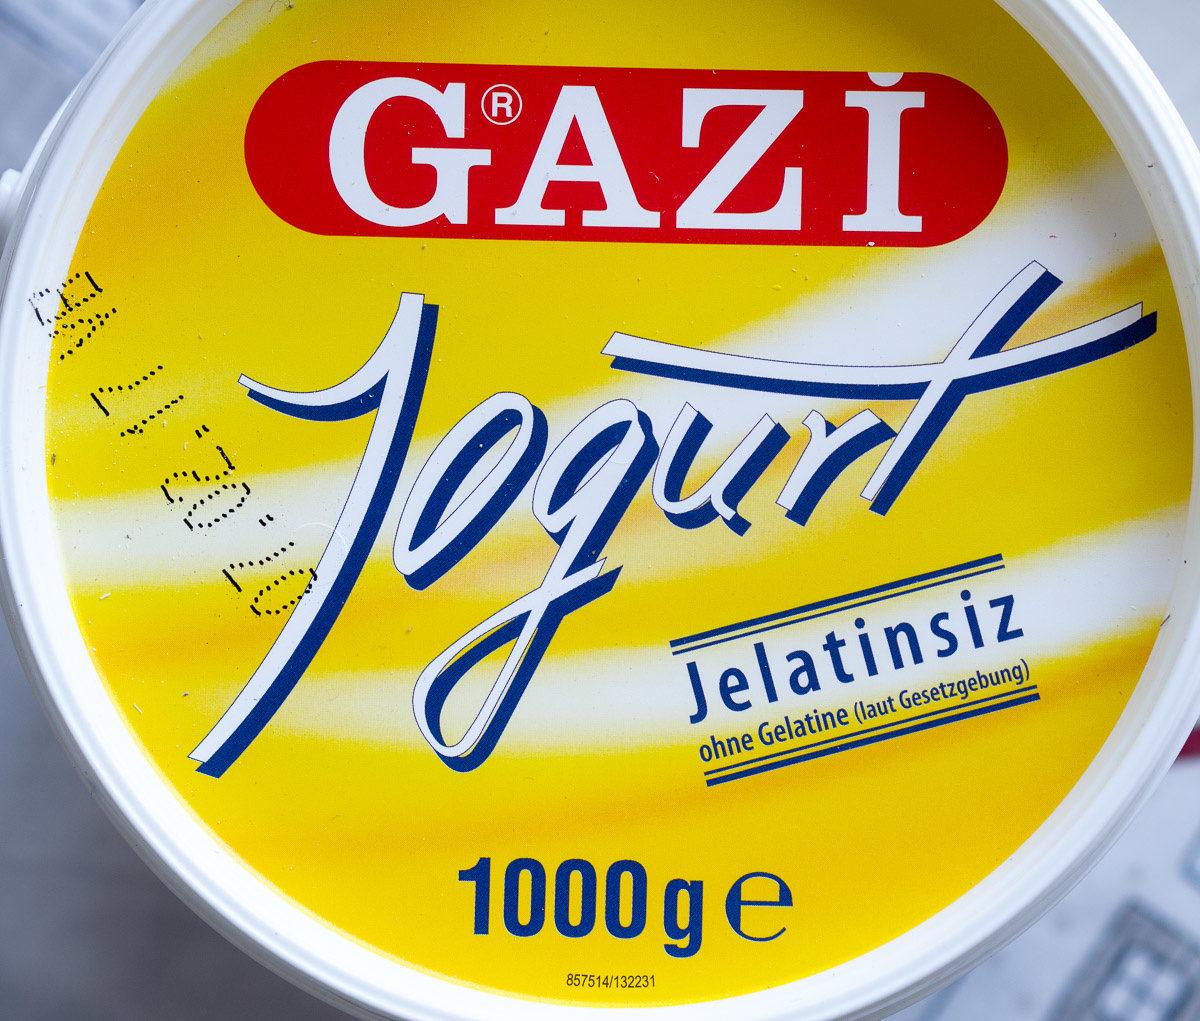 Sahnejoghurt 10% Fett, ohne Gelatine - Product - de